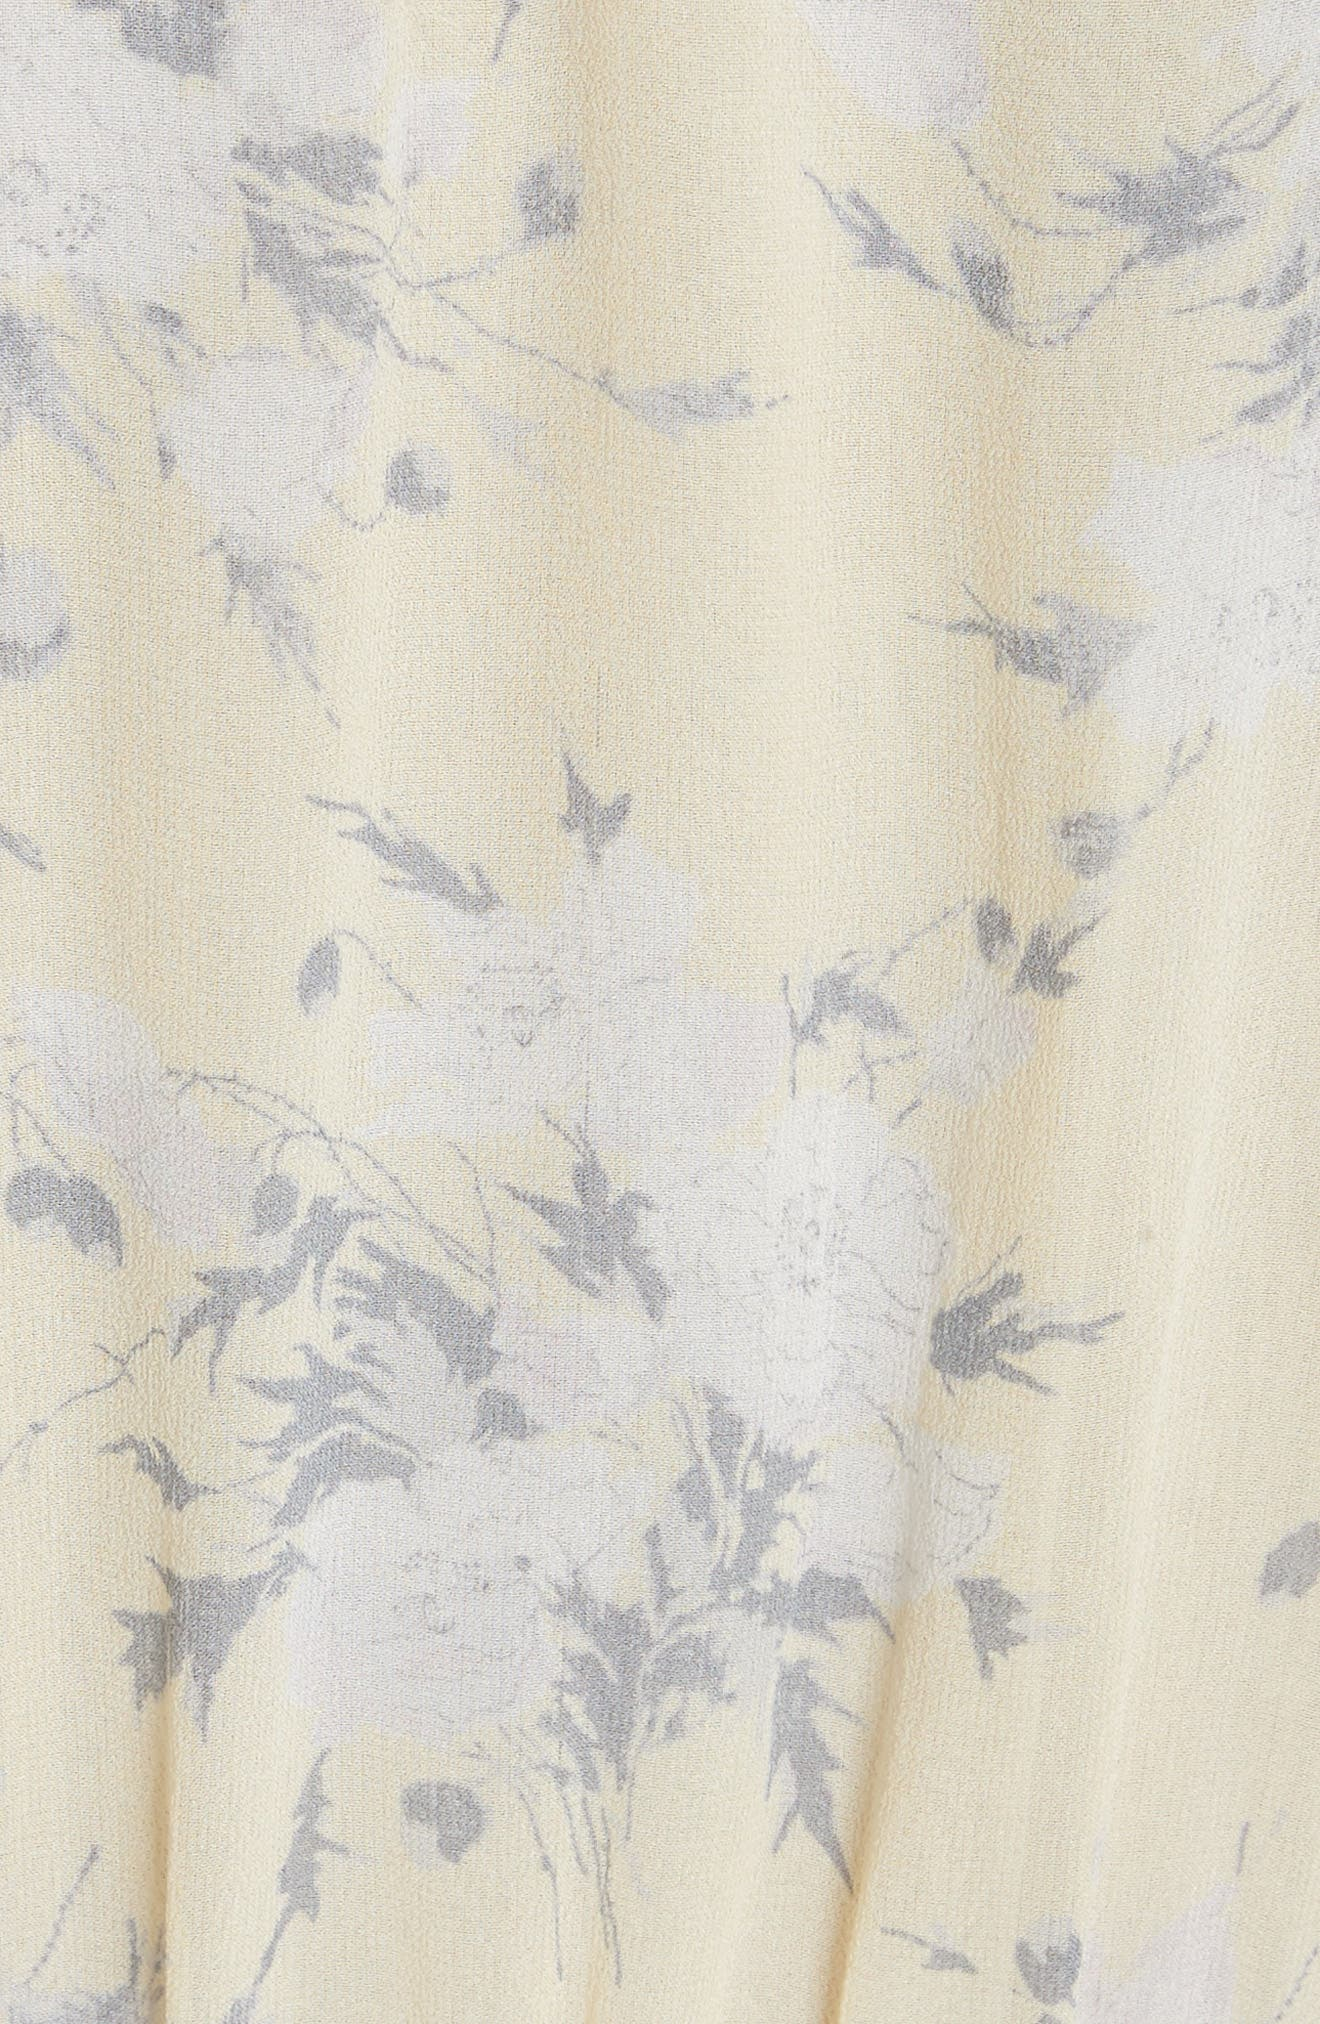 Cold Shoulder Lemon Rose Silk Dress,                             Alternate thumbnail 5, color,                             Lemon Combo